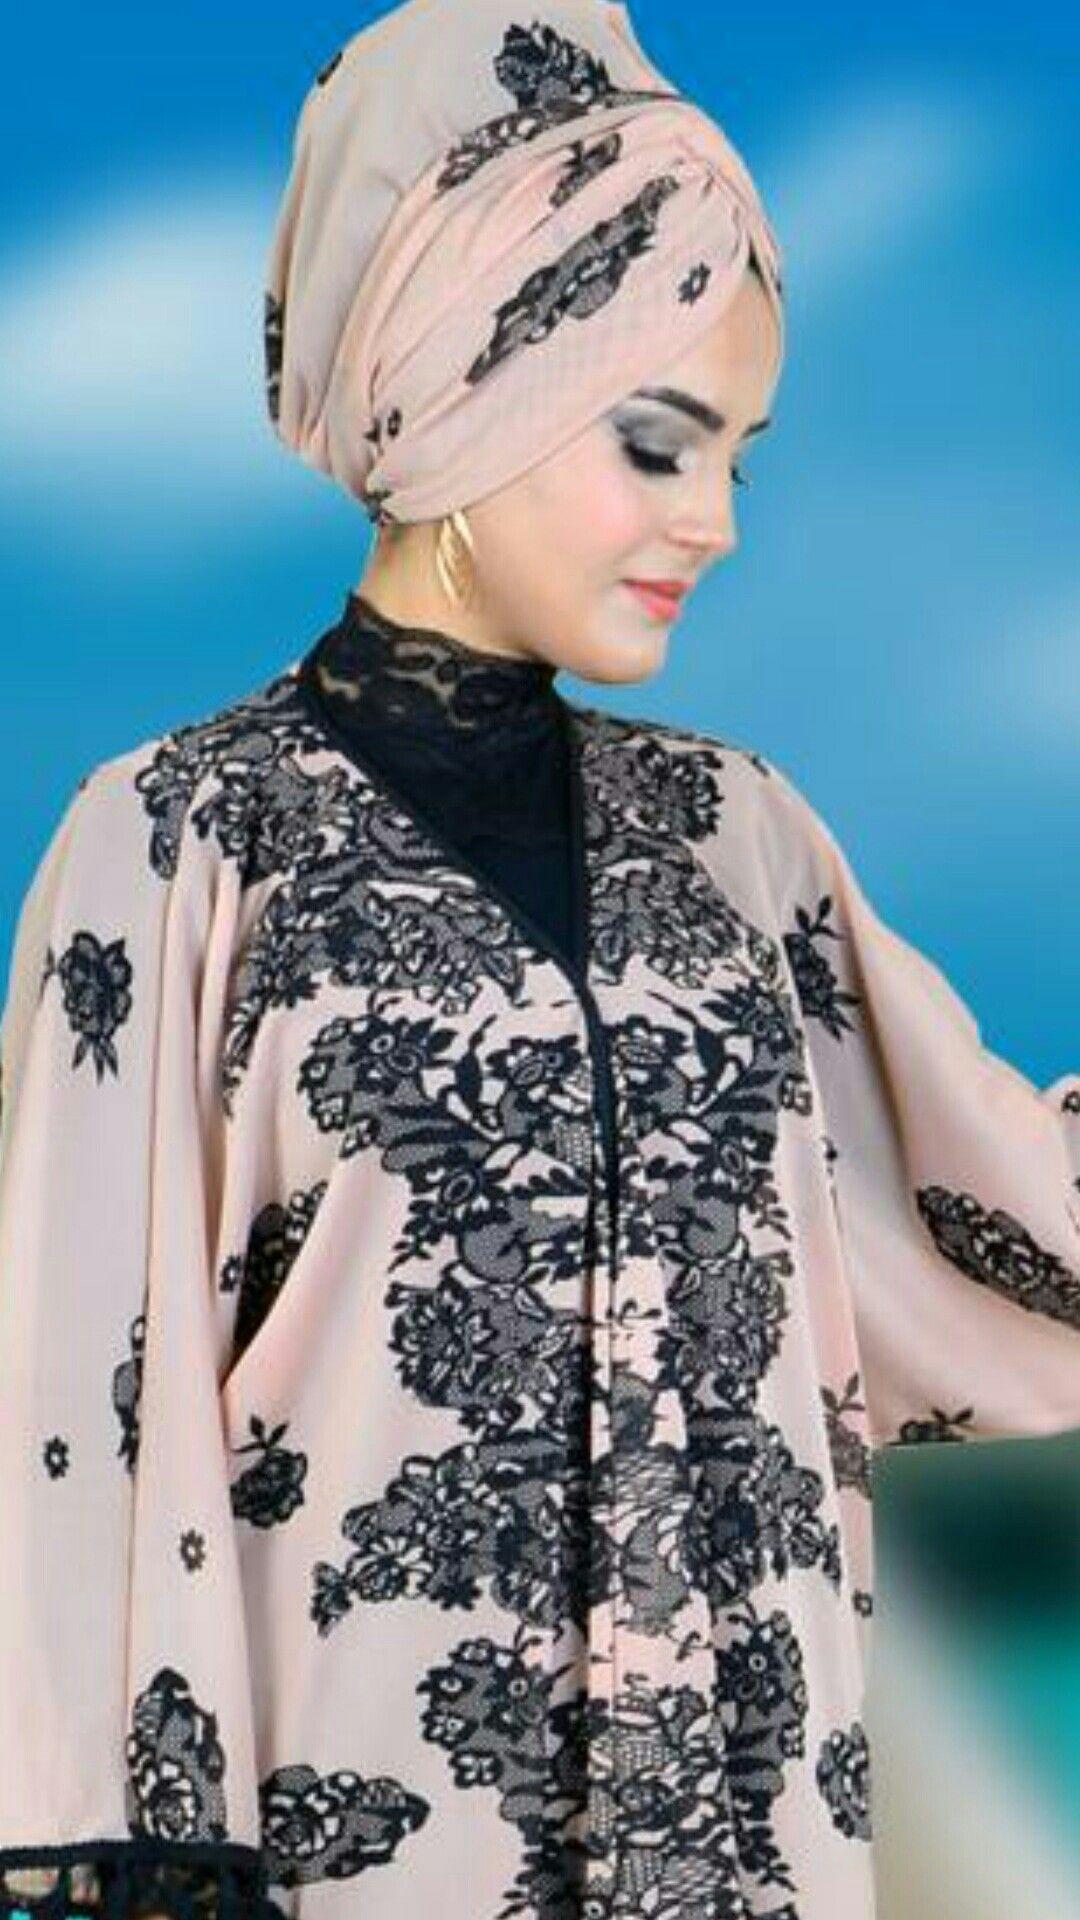 Tesettur Pareo Plaj Ust Giysi Moda Tarz Trend Yeni Sezon Fashion Bomber Jacket Jackets